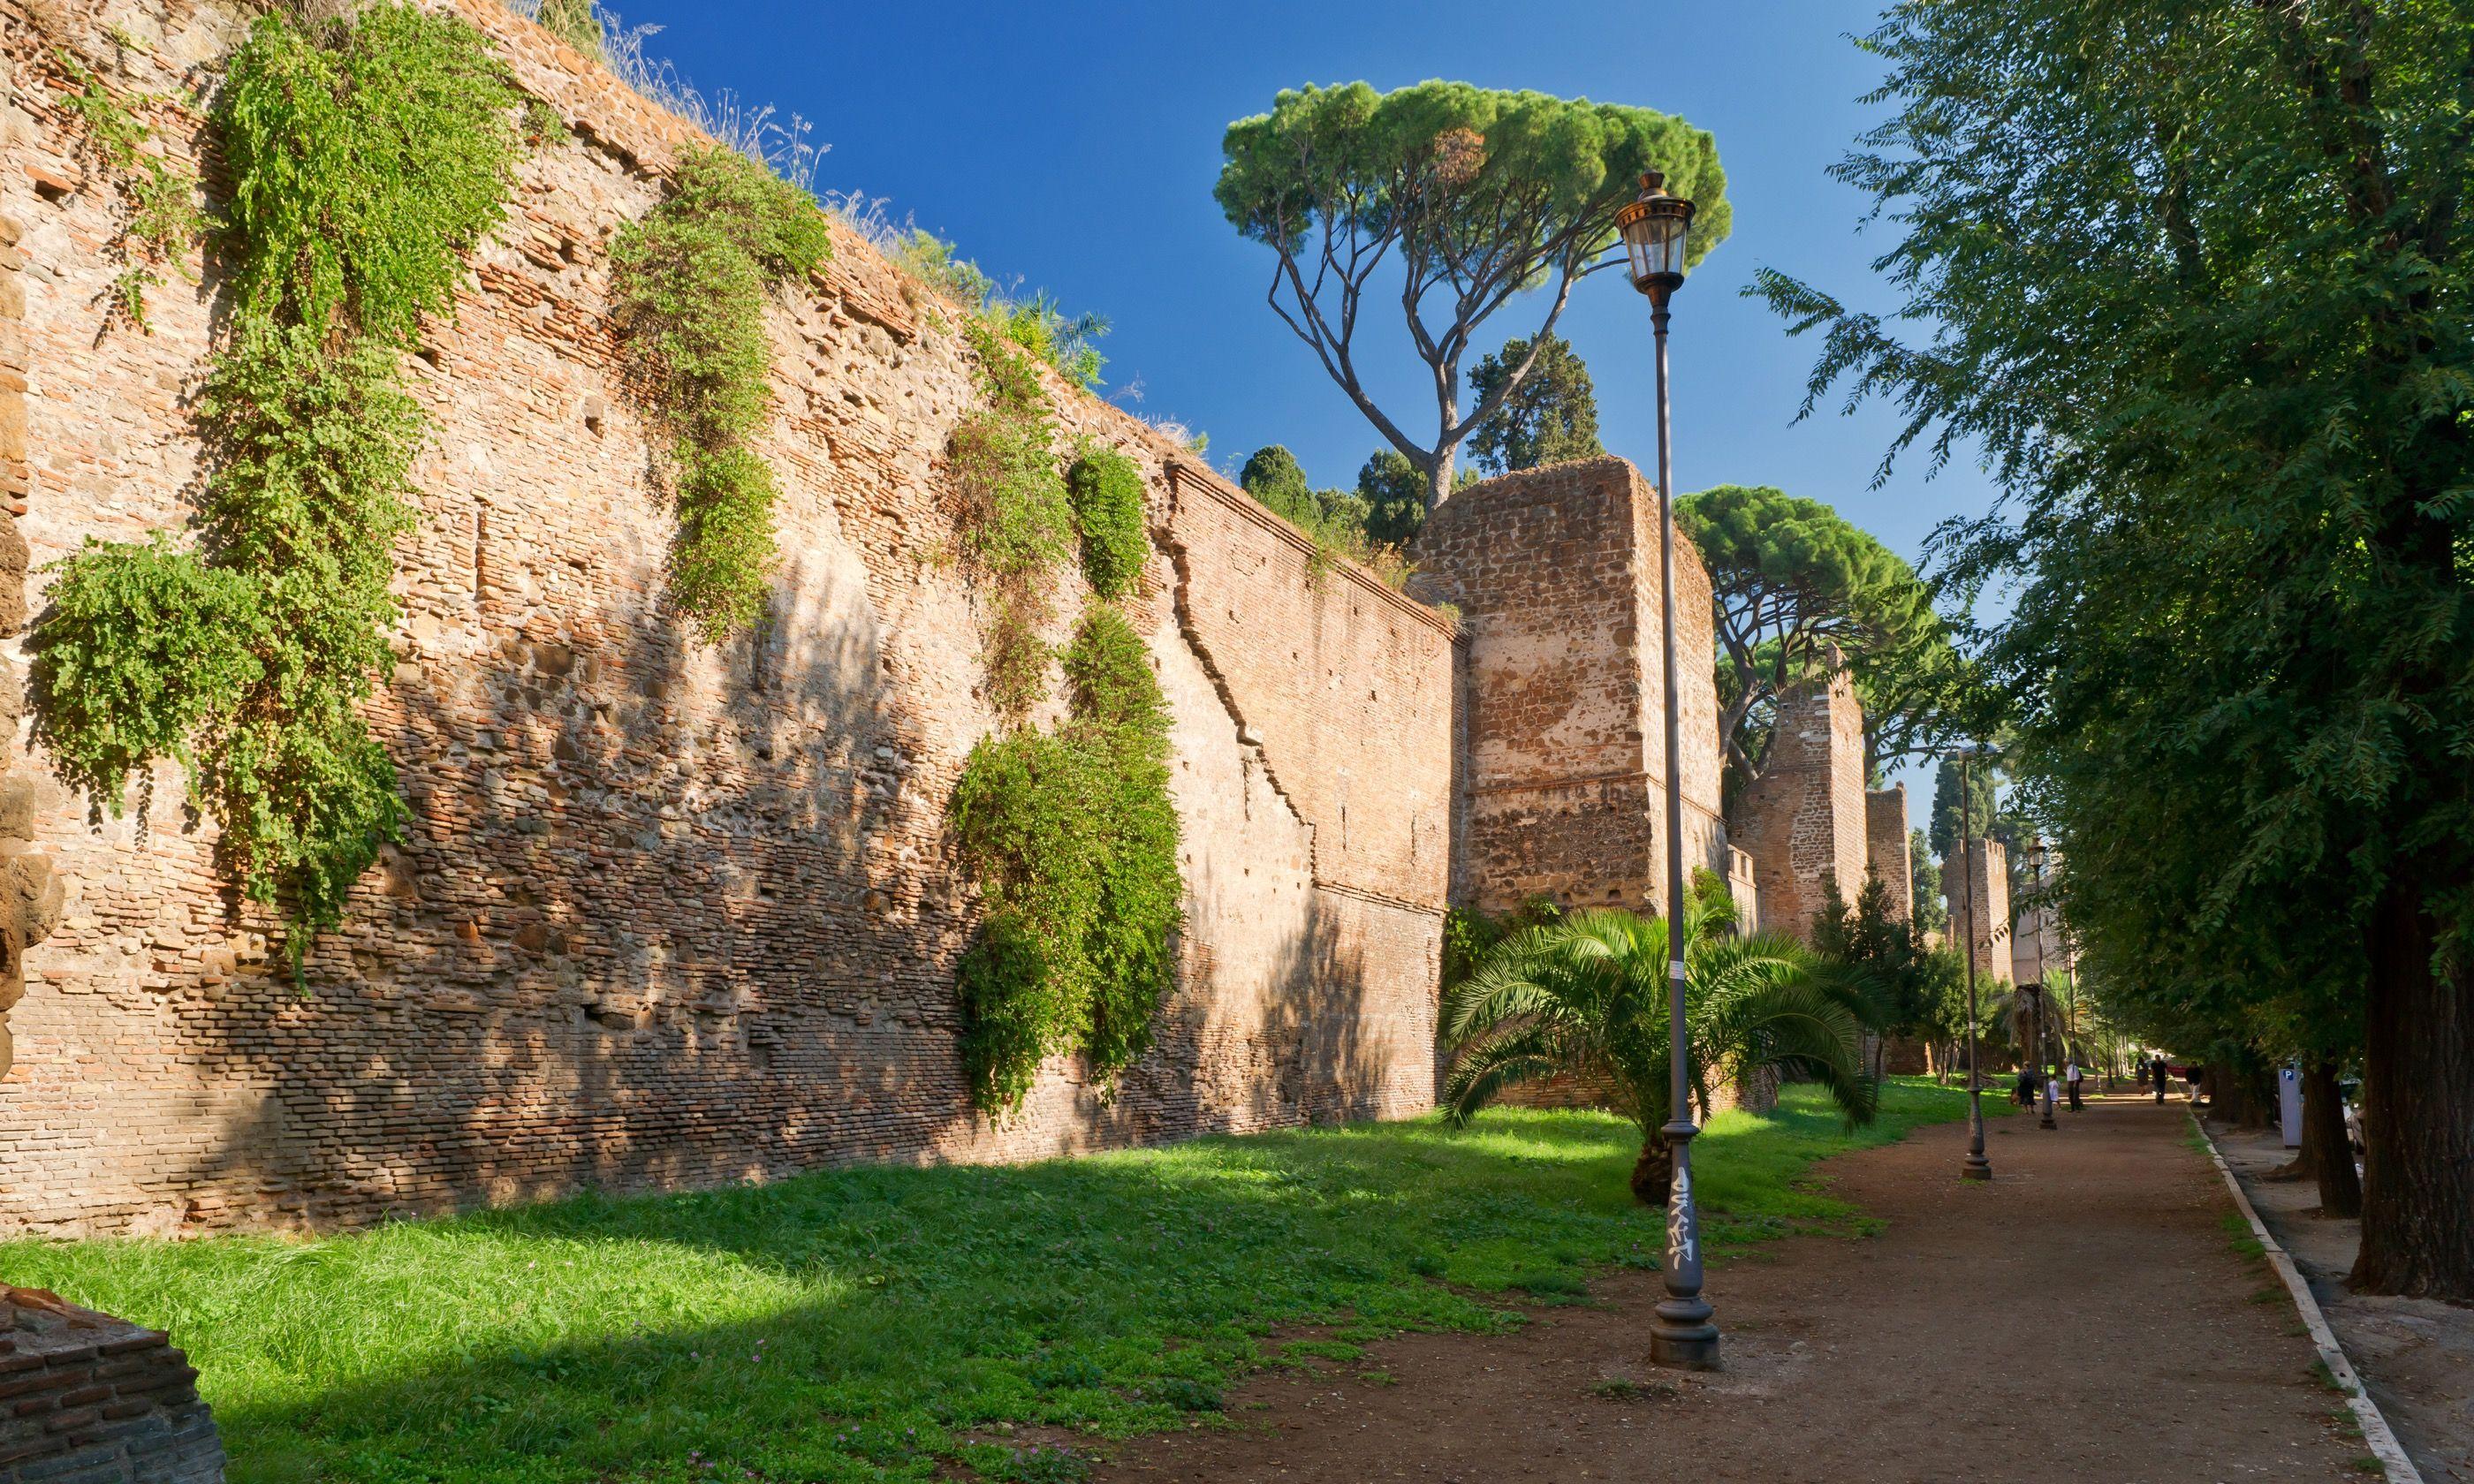 The ancient Aurelian walls in Rome (Dreamstime)